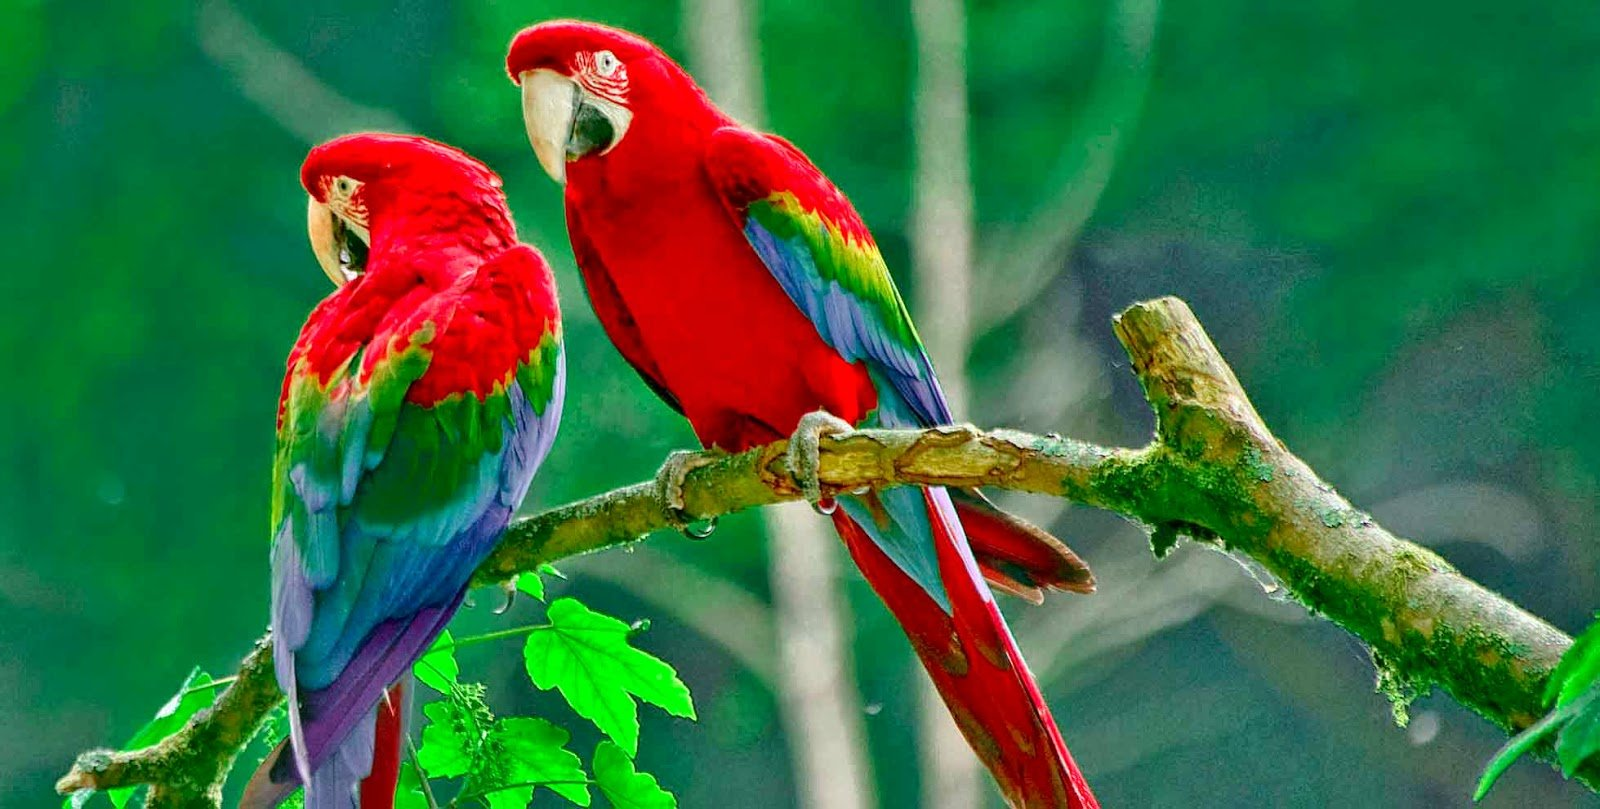 Bird of paradise wallpaper wallpapersafari - Hd birds images download ...